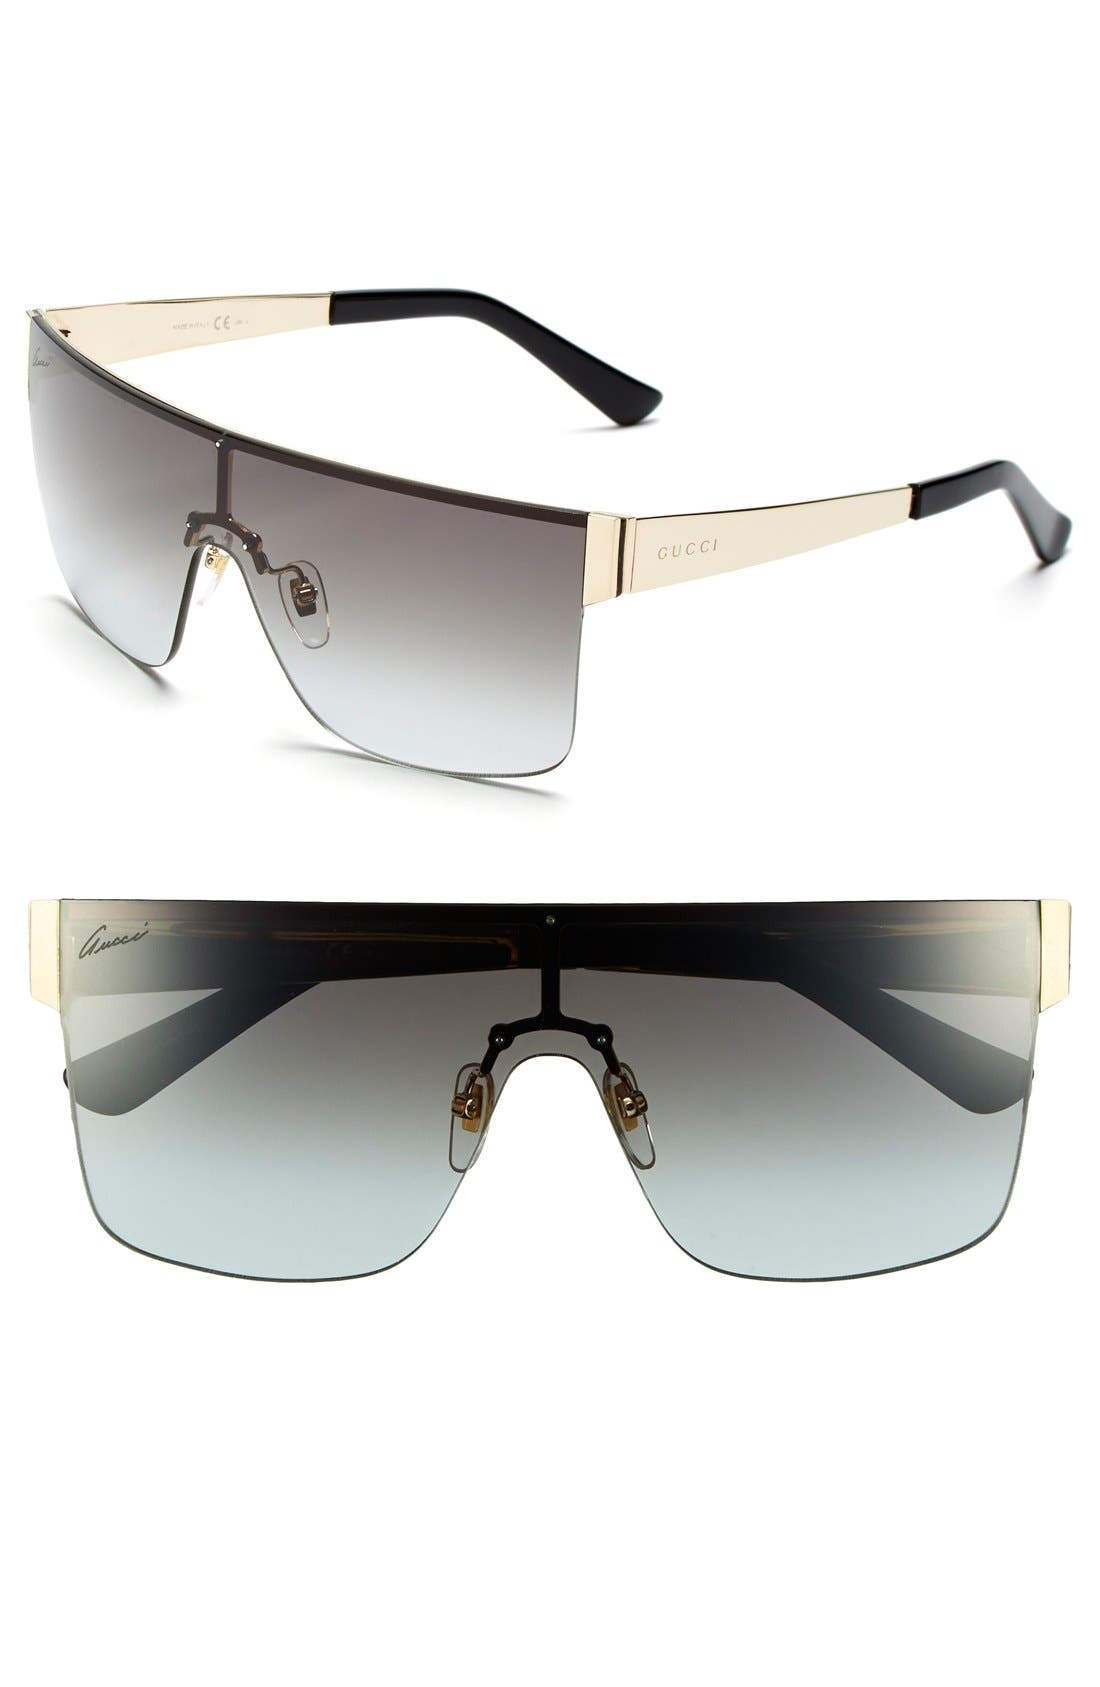 99mm Shield Sunglasses,                             Main thumbnail 1, color,                             710